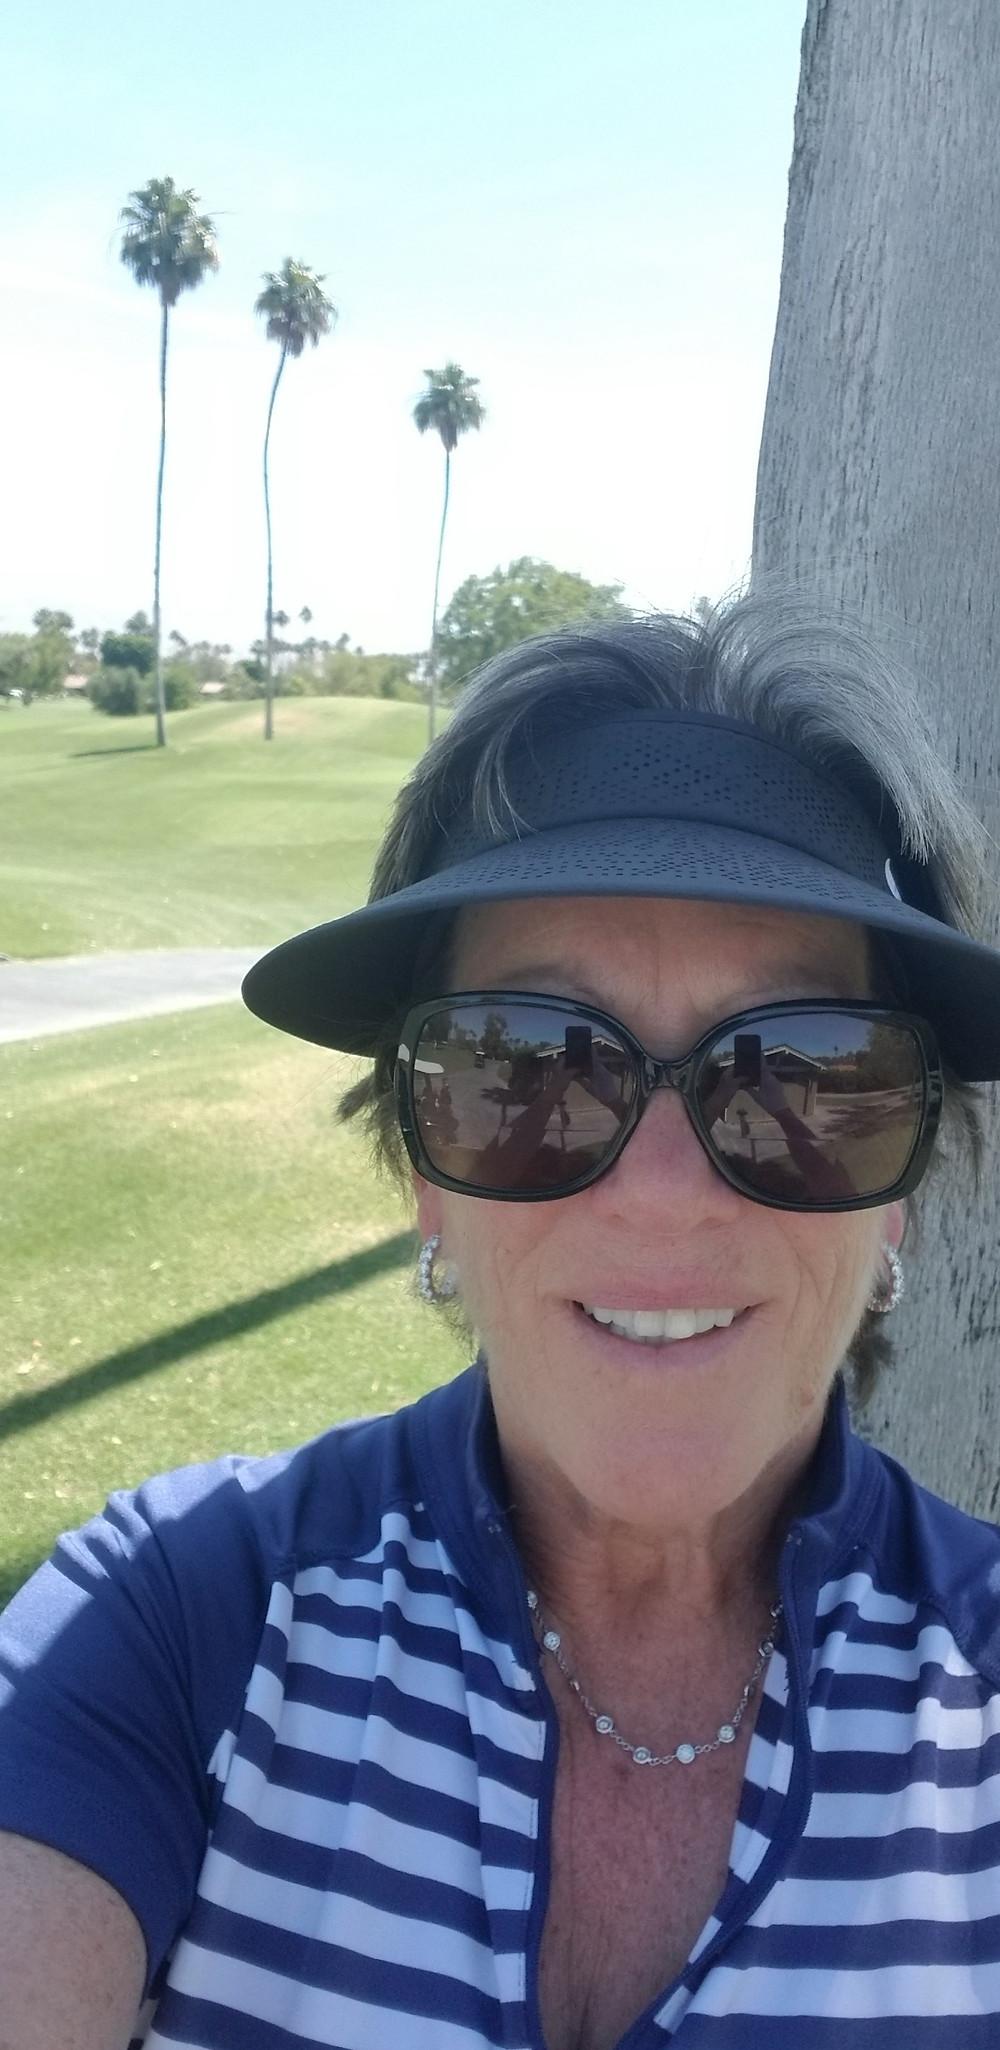 Brenda Newman on a golf course in California